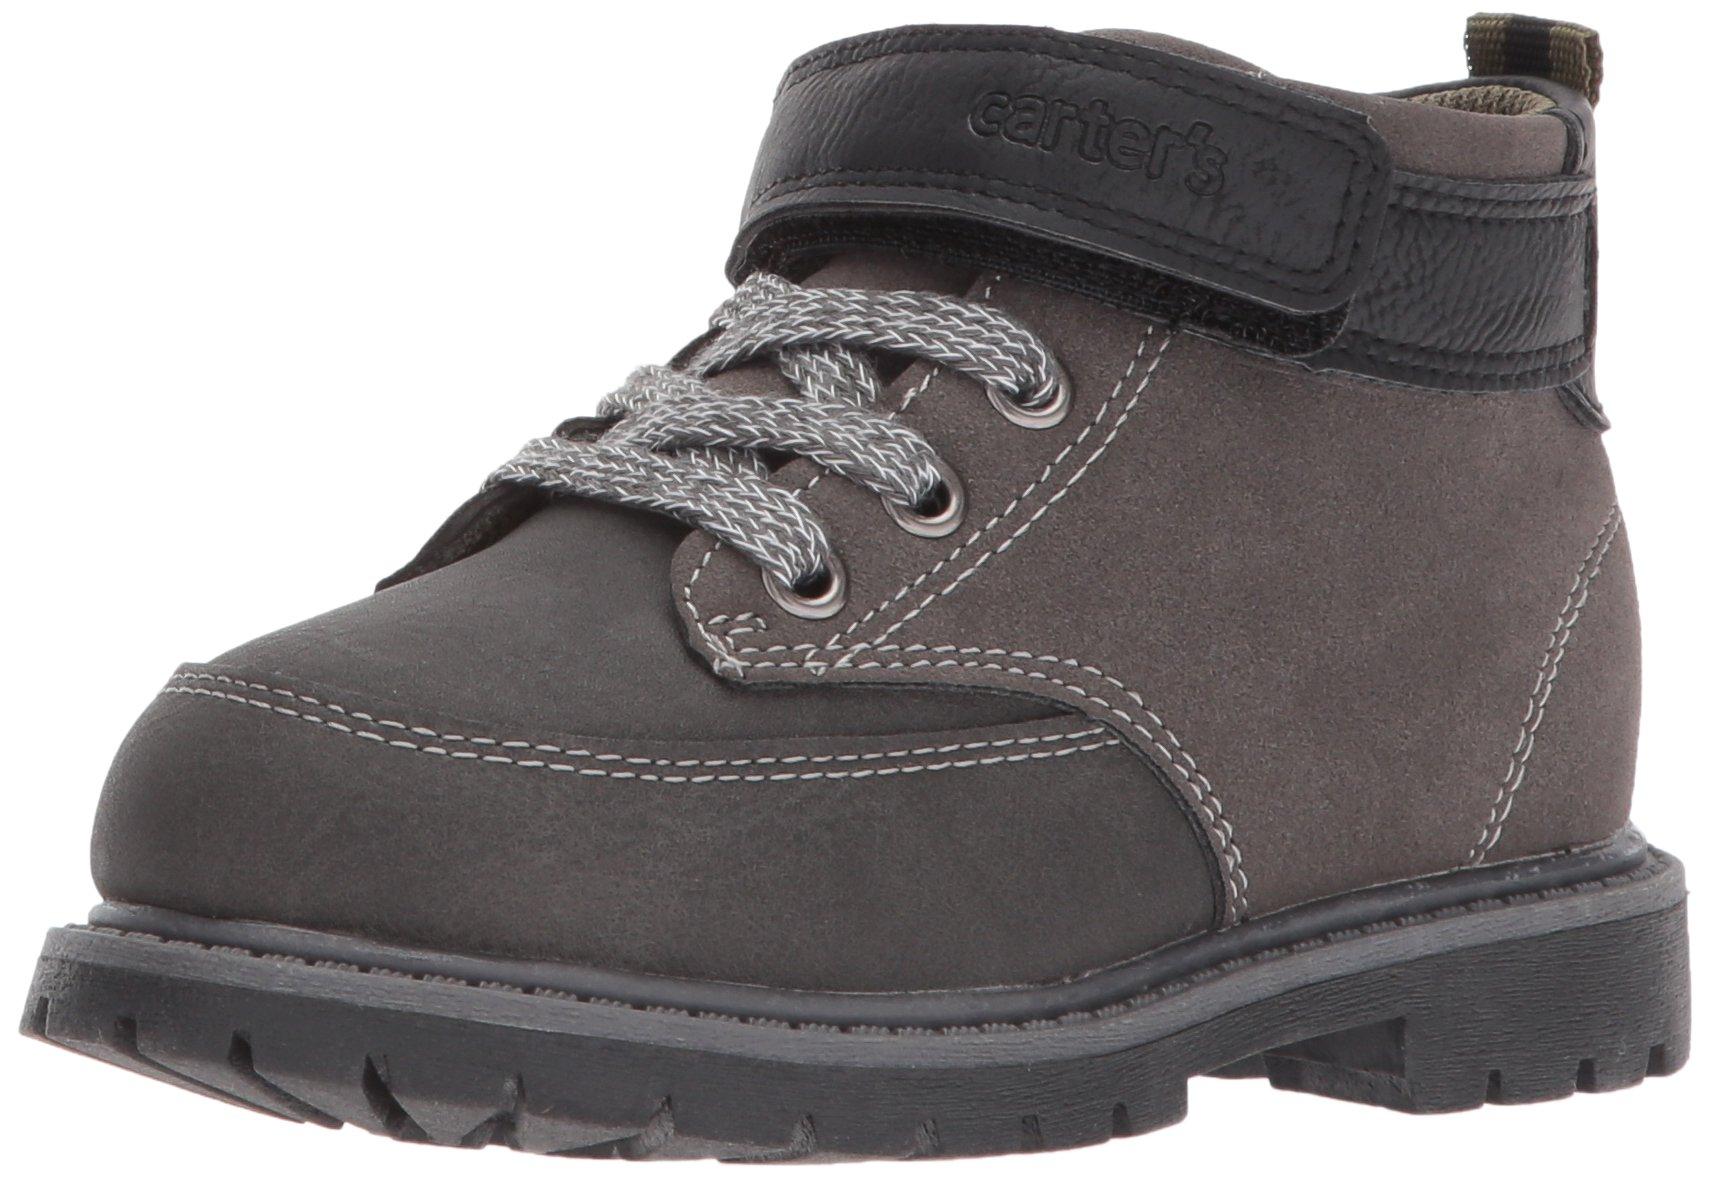 Carter's Boys' Pecs Fashion Boot, Grey/Black, 9 M US Toddler